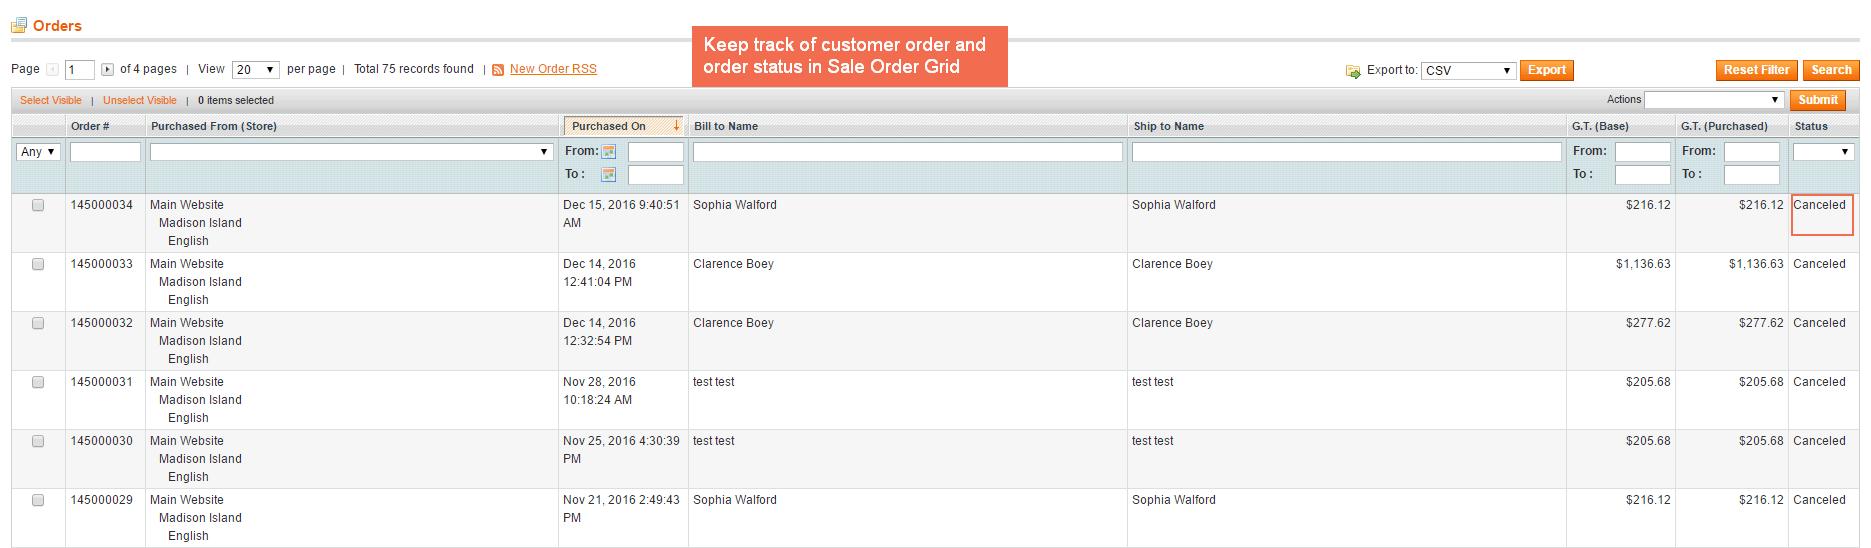 Keep track of canceled orders in Sales Order Grid